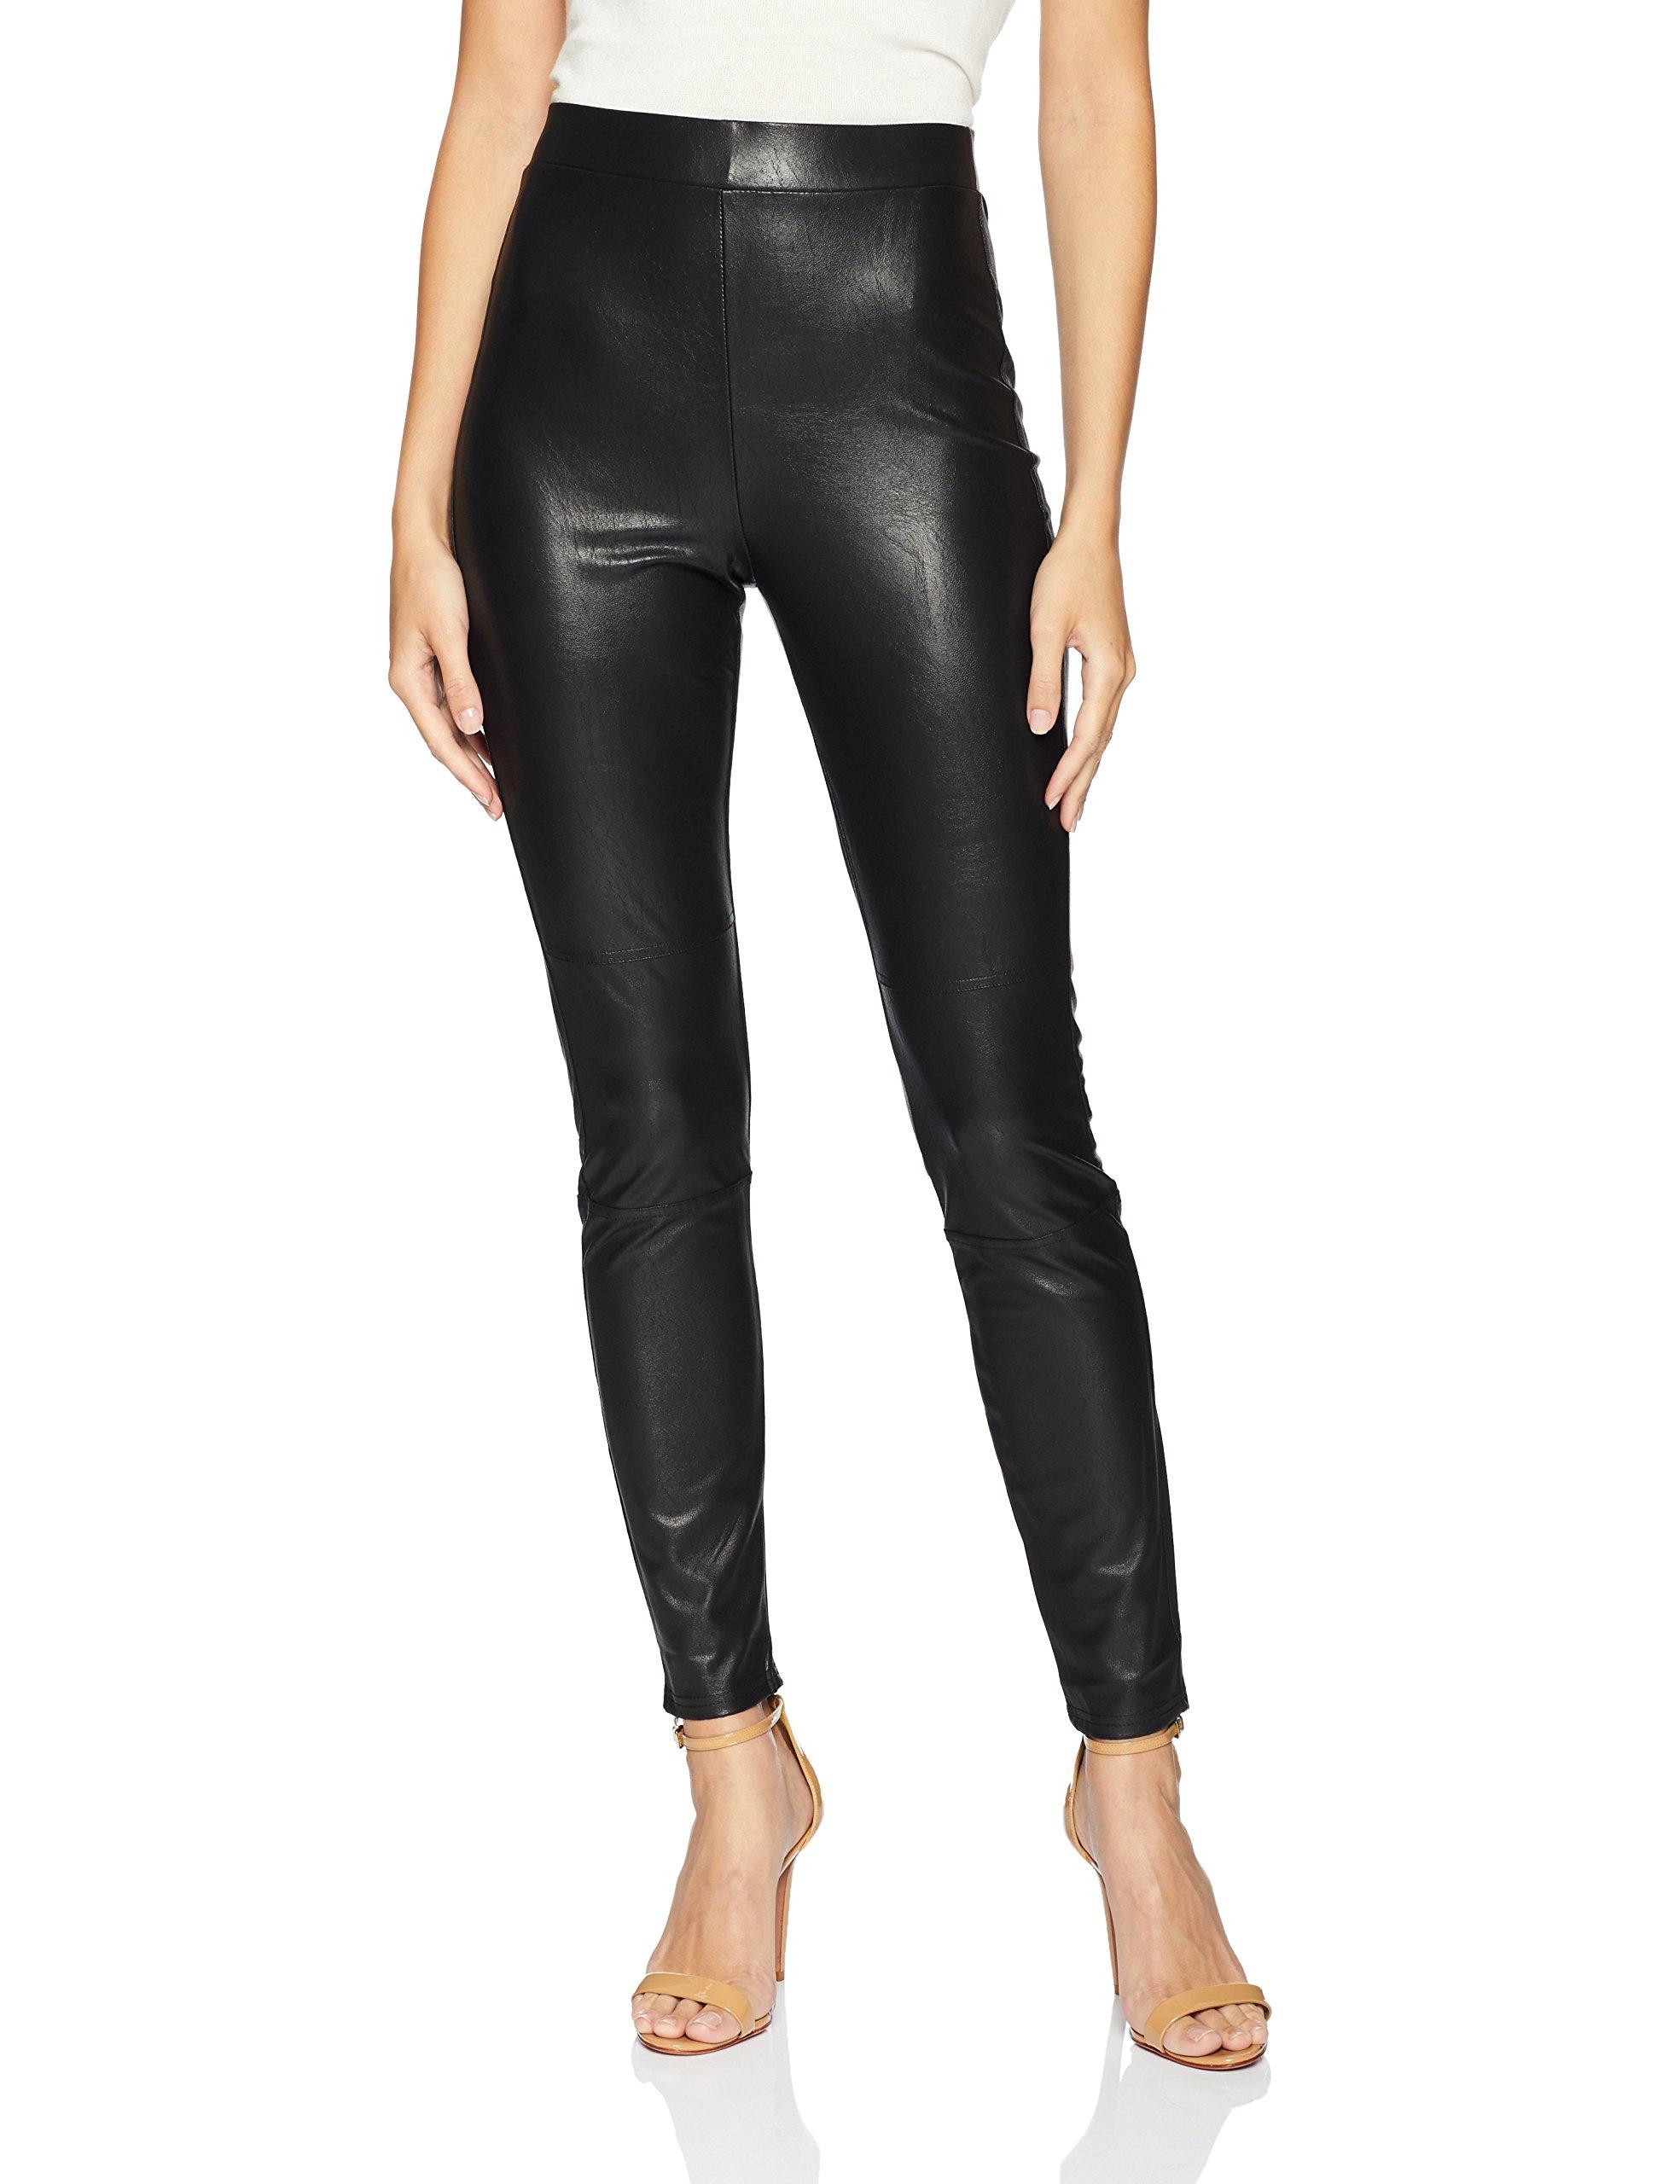 Splendid Women's Faux Leather Legging, Black, M